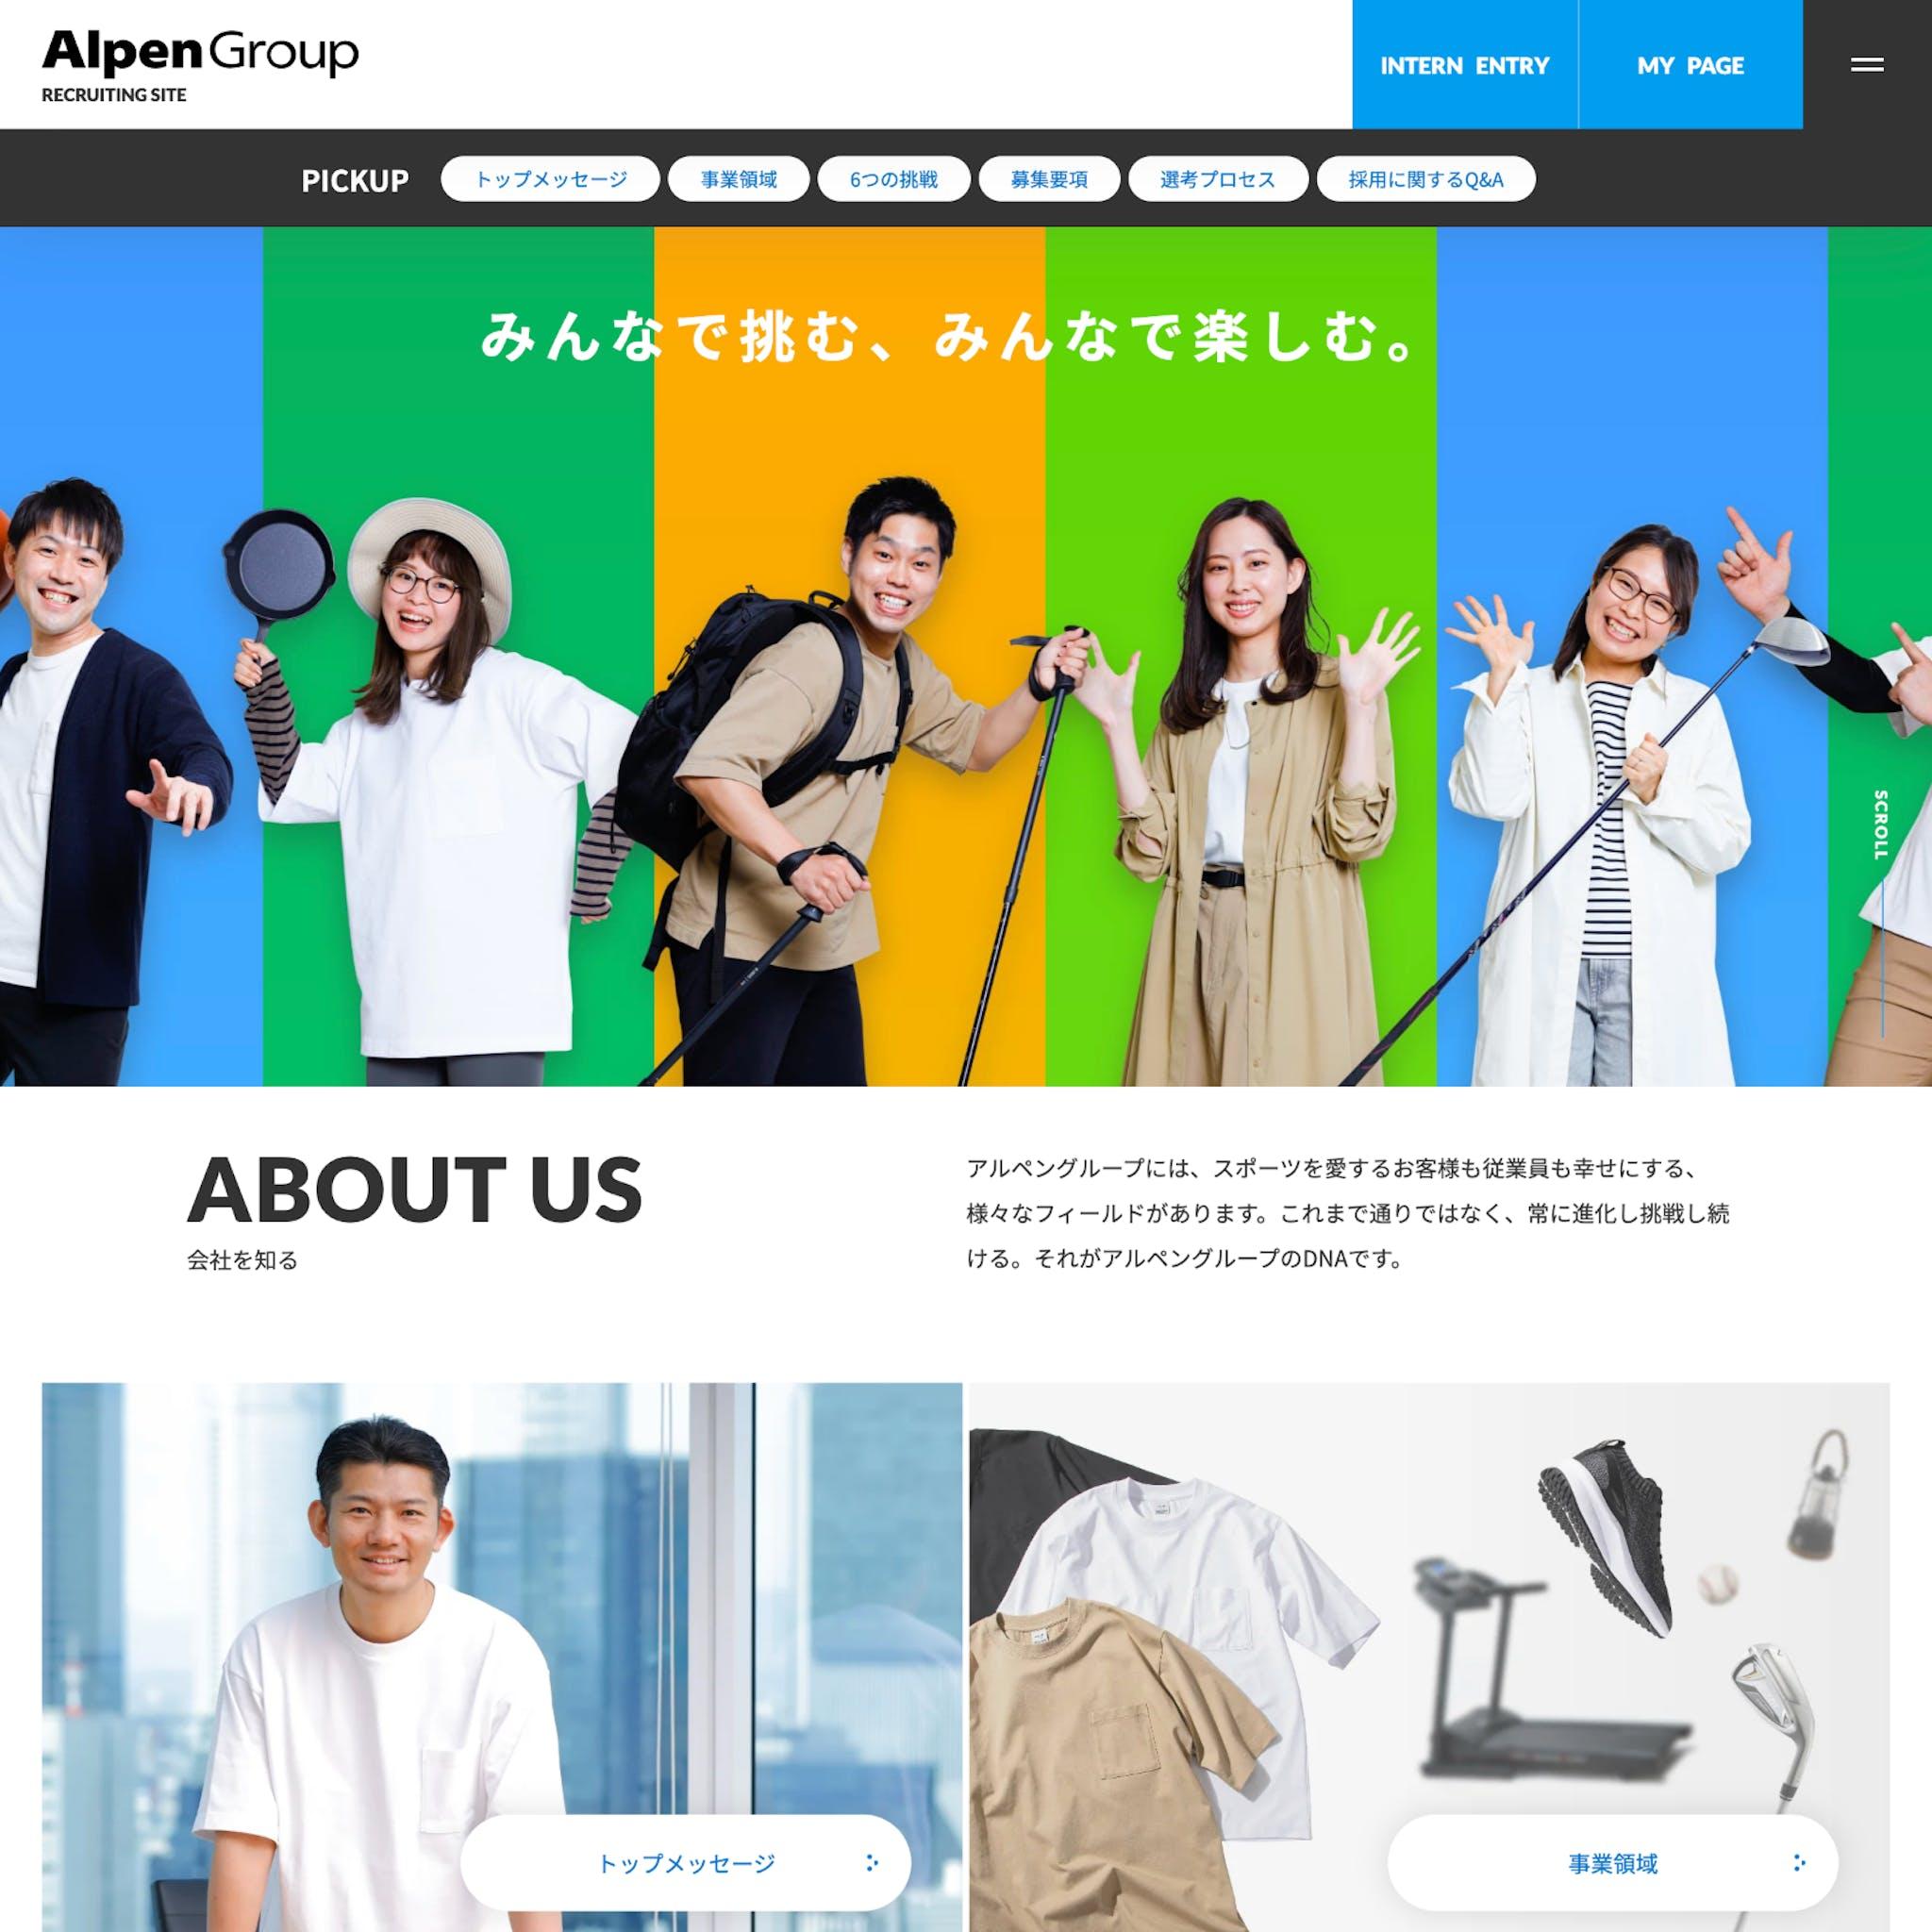 Alpen Groupさま/新卒採用サイト